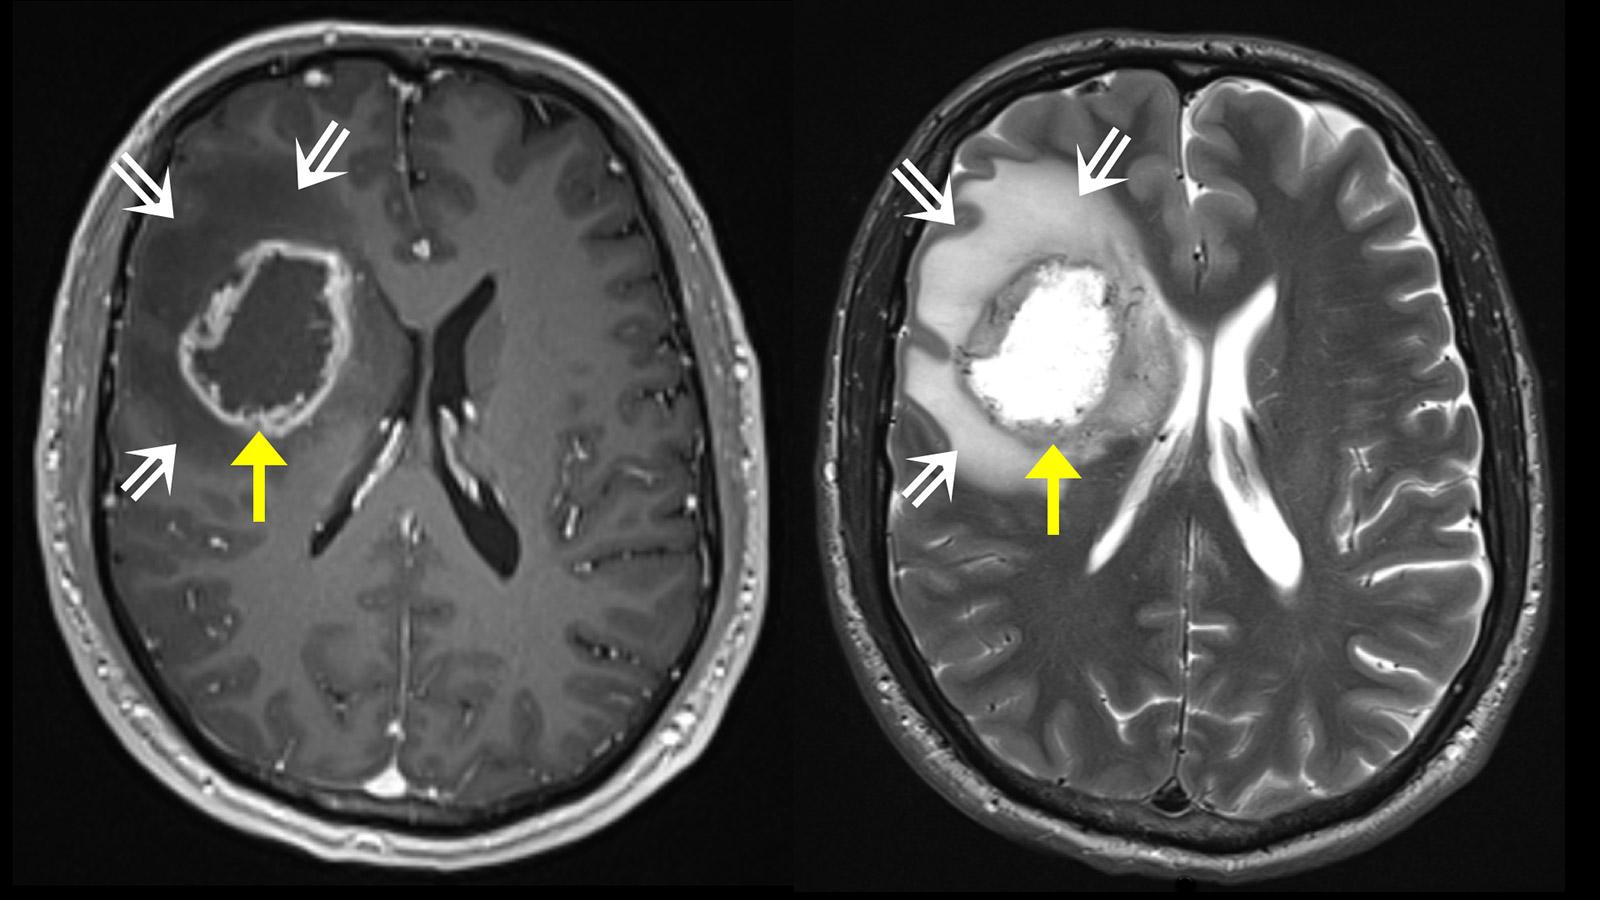 Endstadium gehirntumor glioblastom Gehirntumor: Krebs